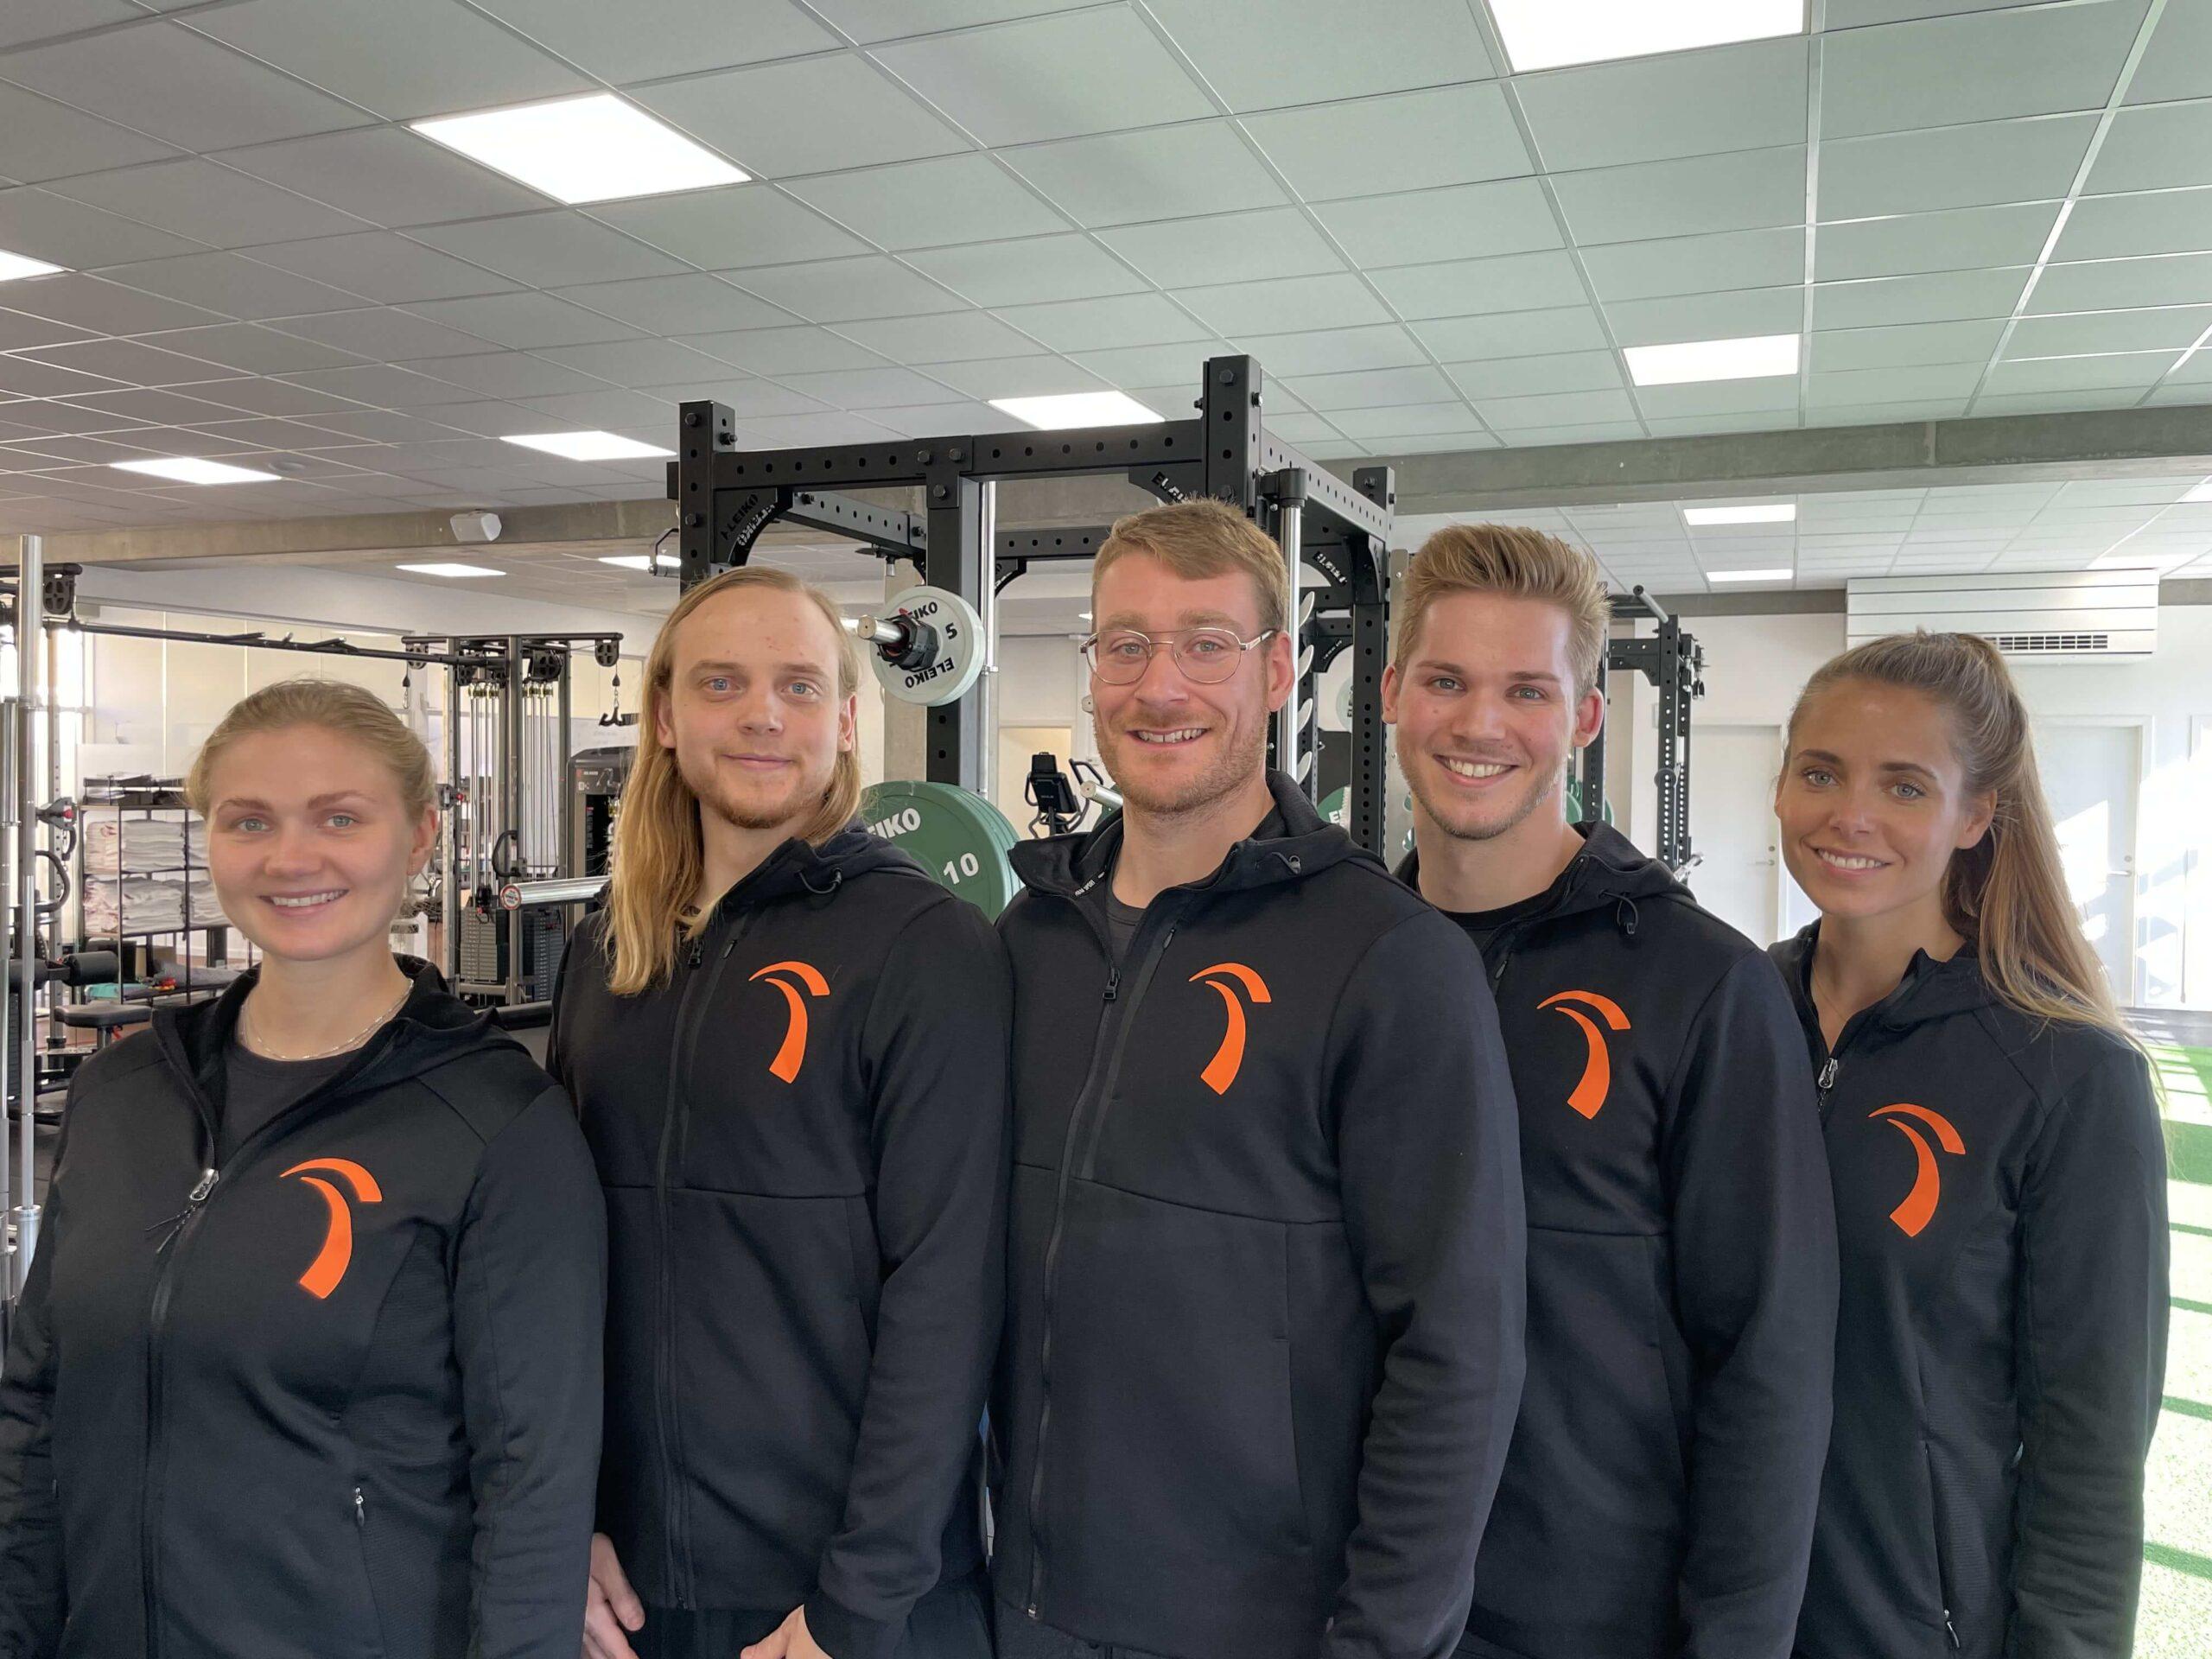 Personlig træning team ACT GYM